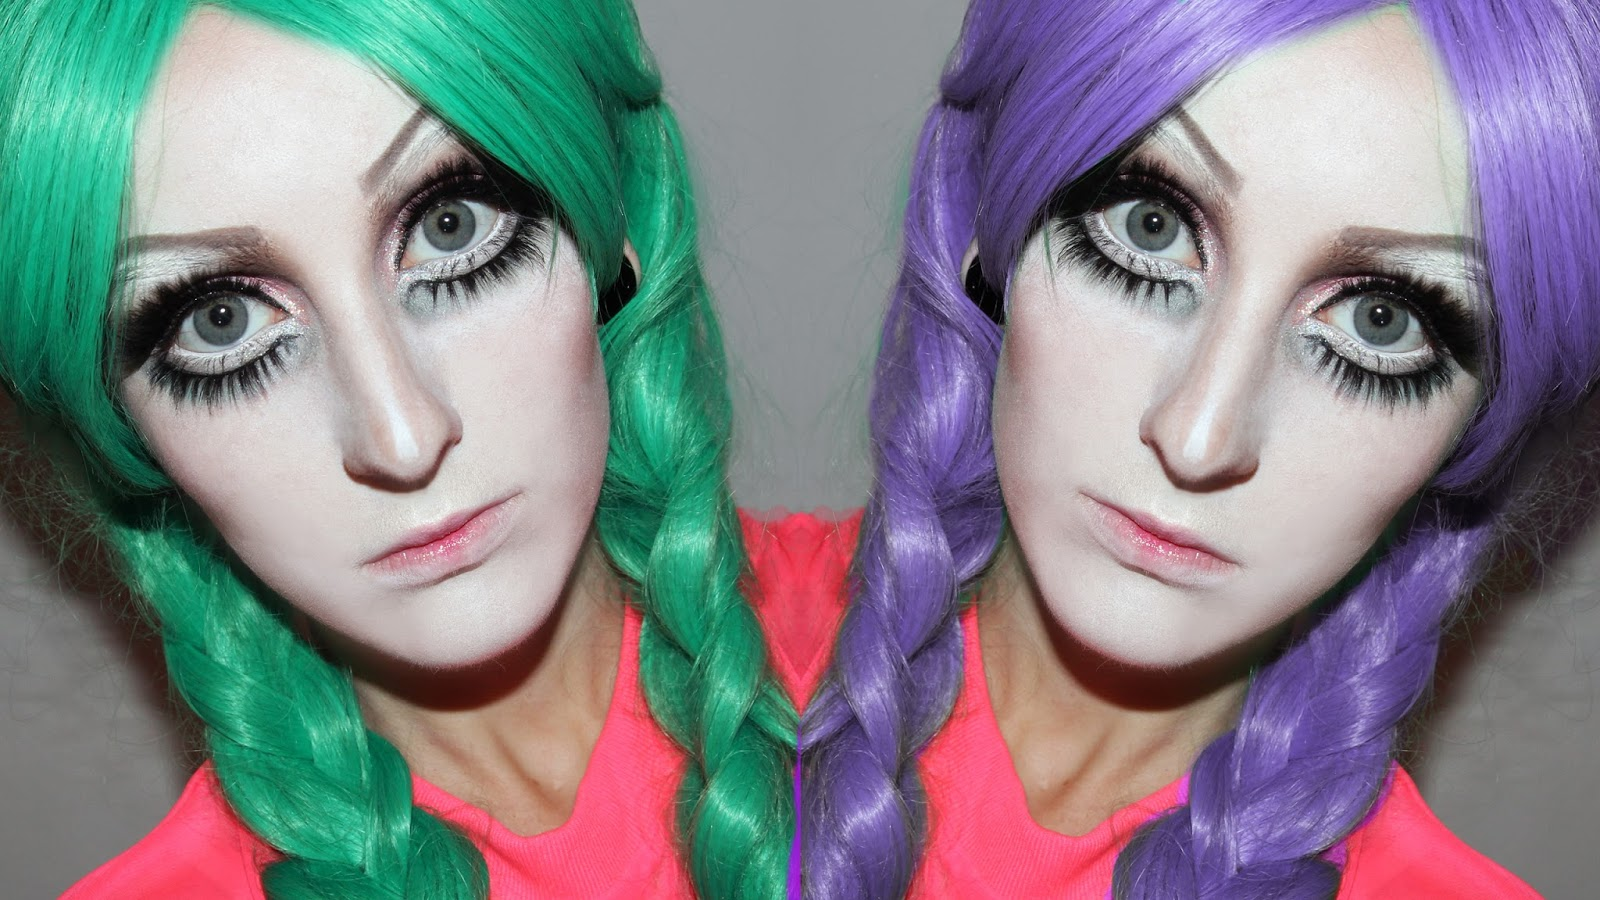 Kristianathe blog how to anime girl transformation makeup tutorial how to anime girl transformation makeup tutorial part 2 baditri Image collections